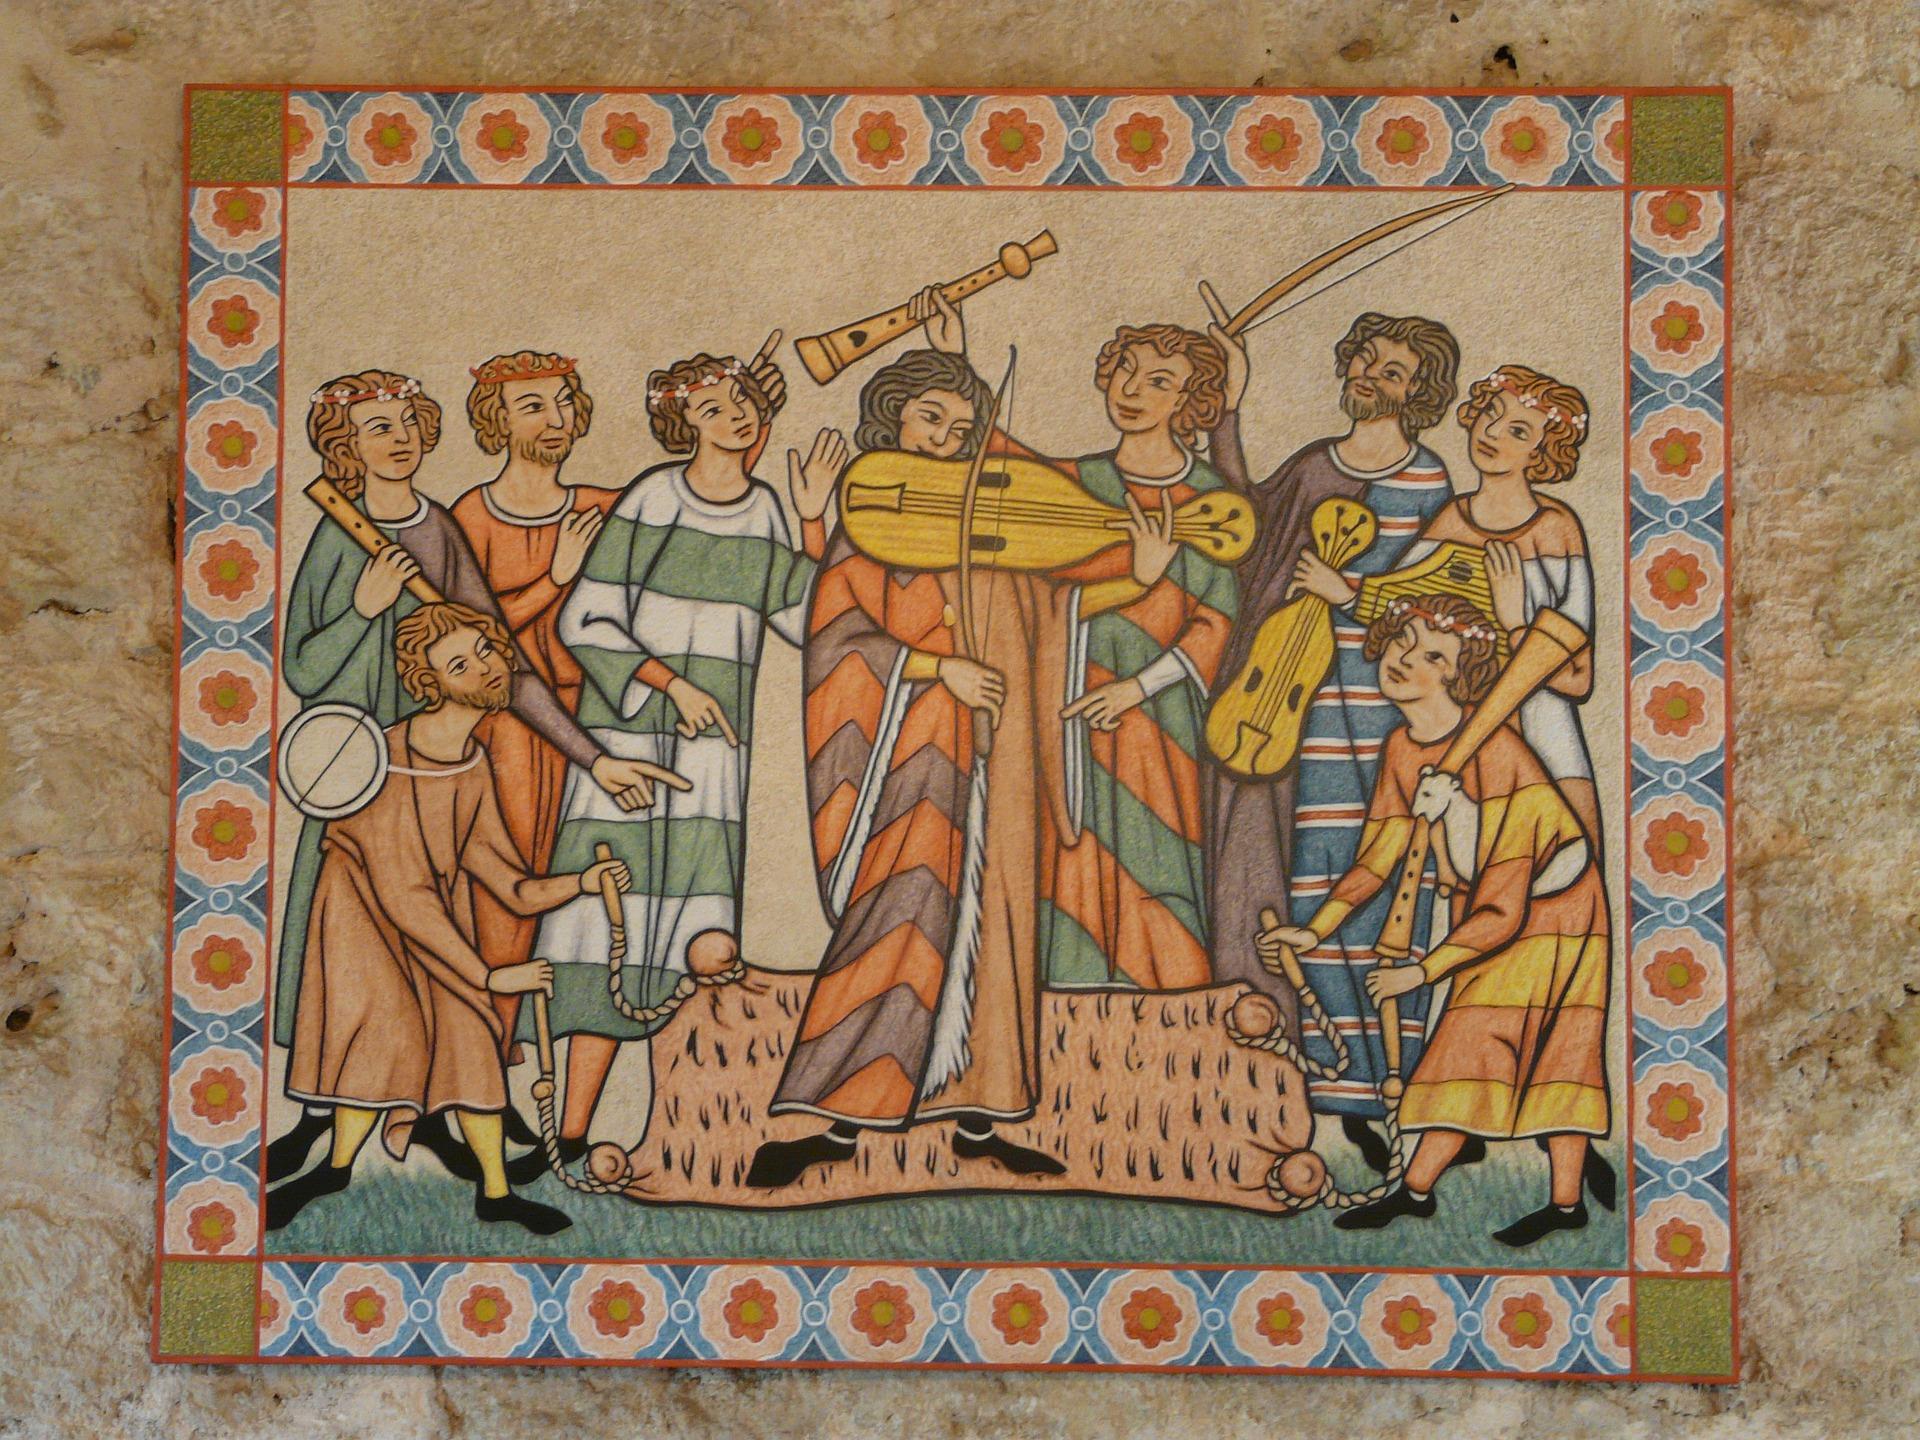 fresco-3357_1920